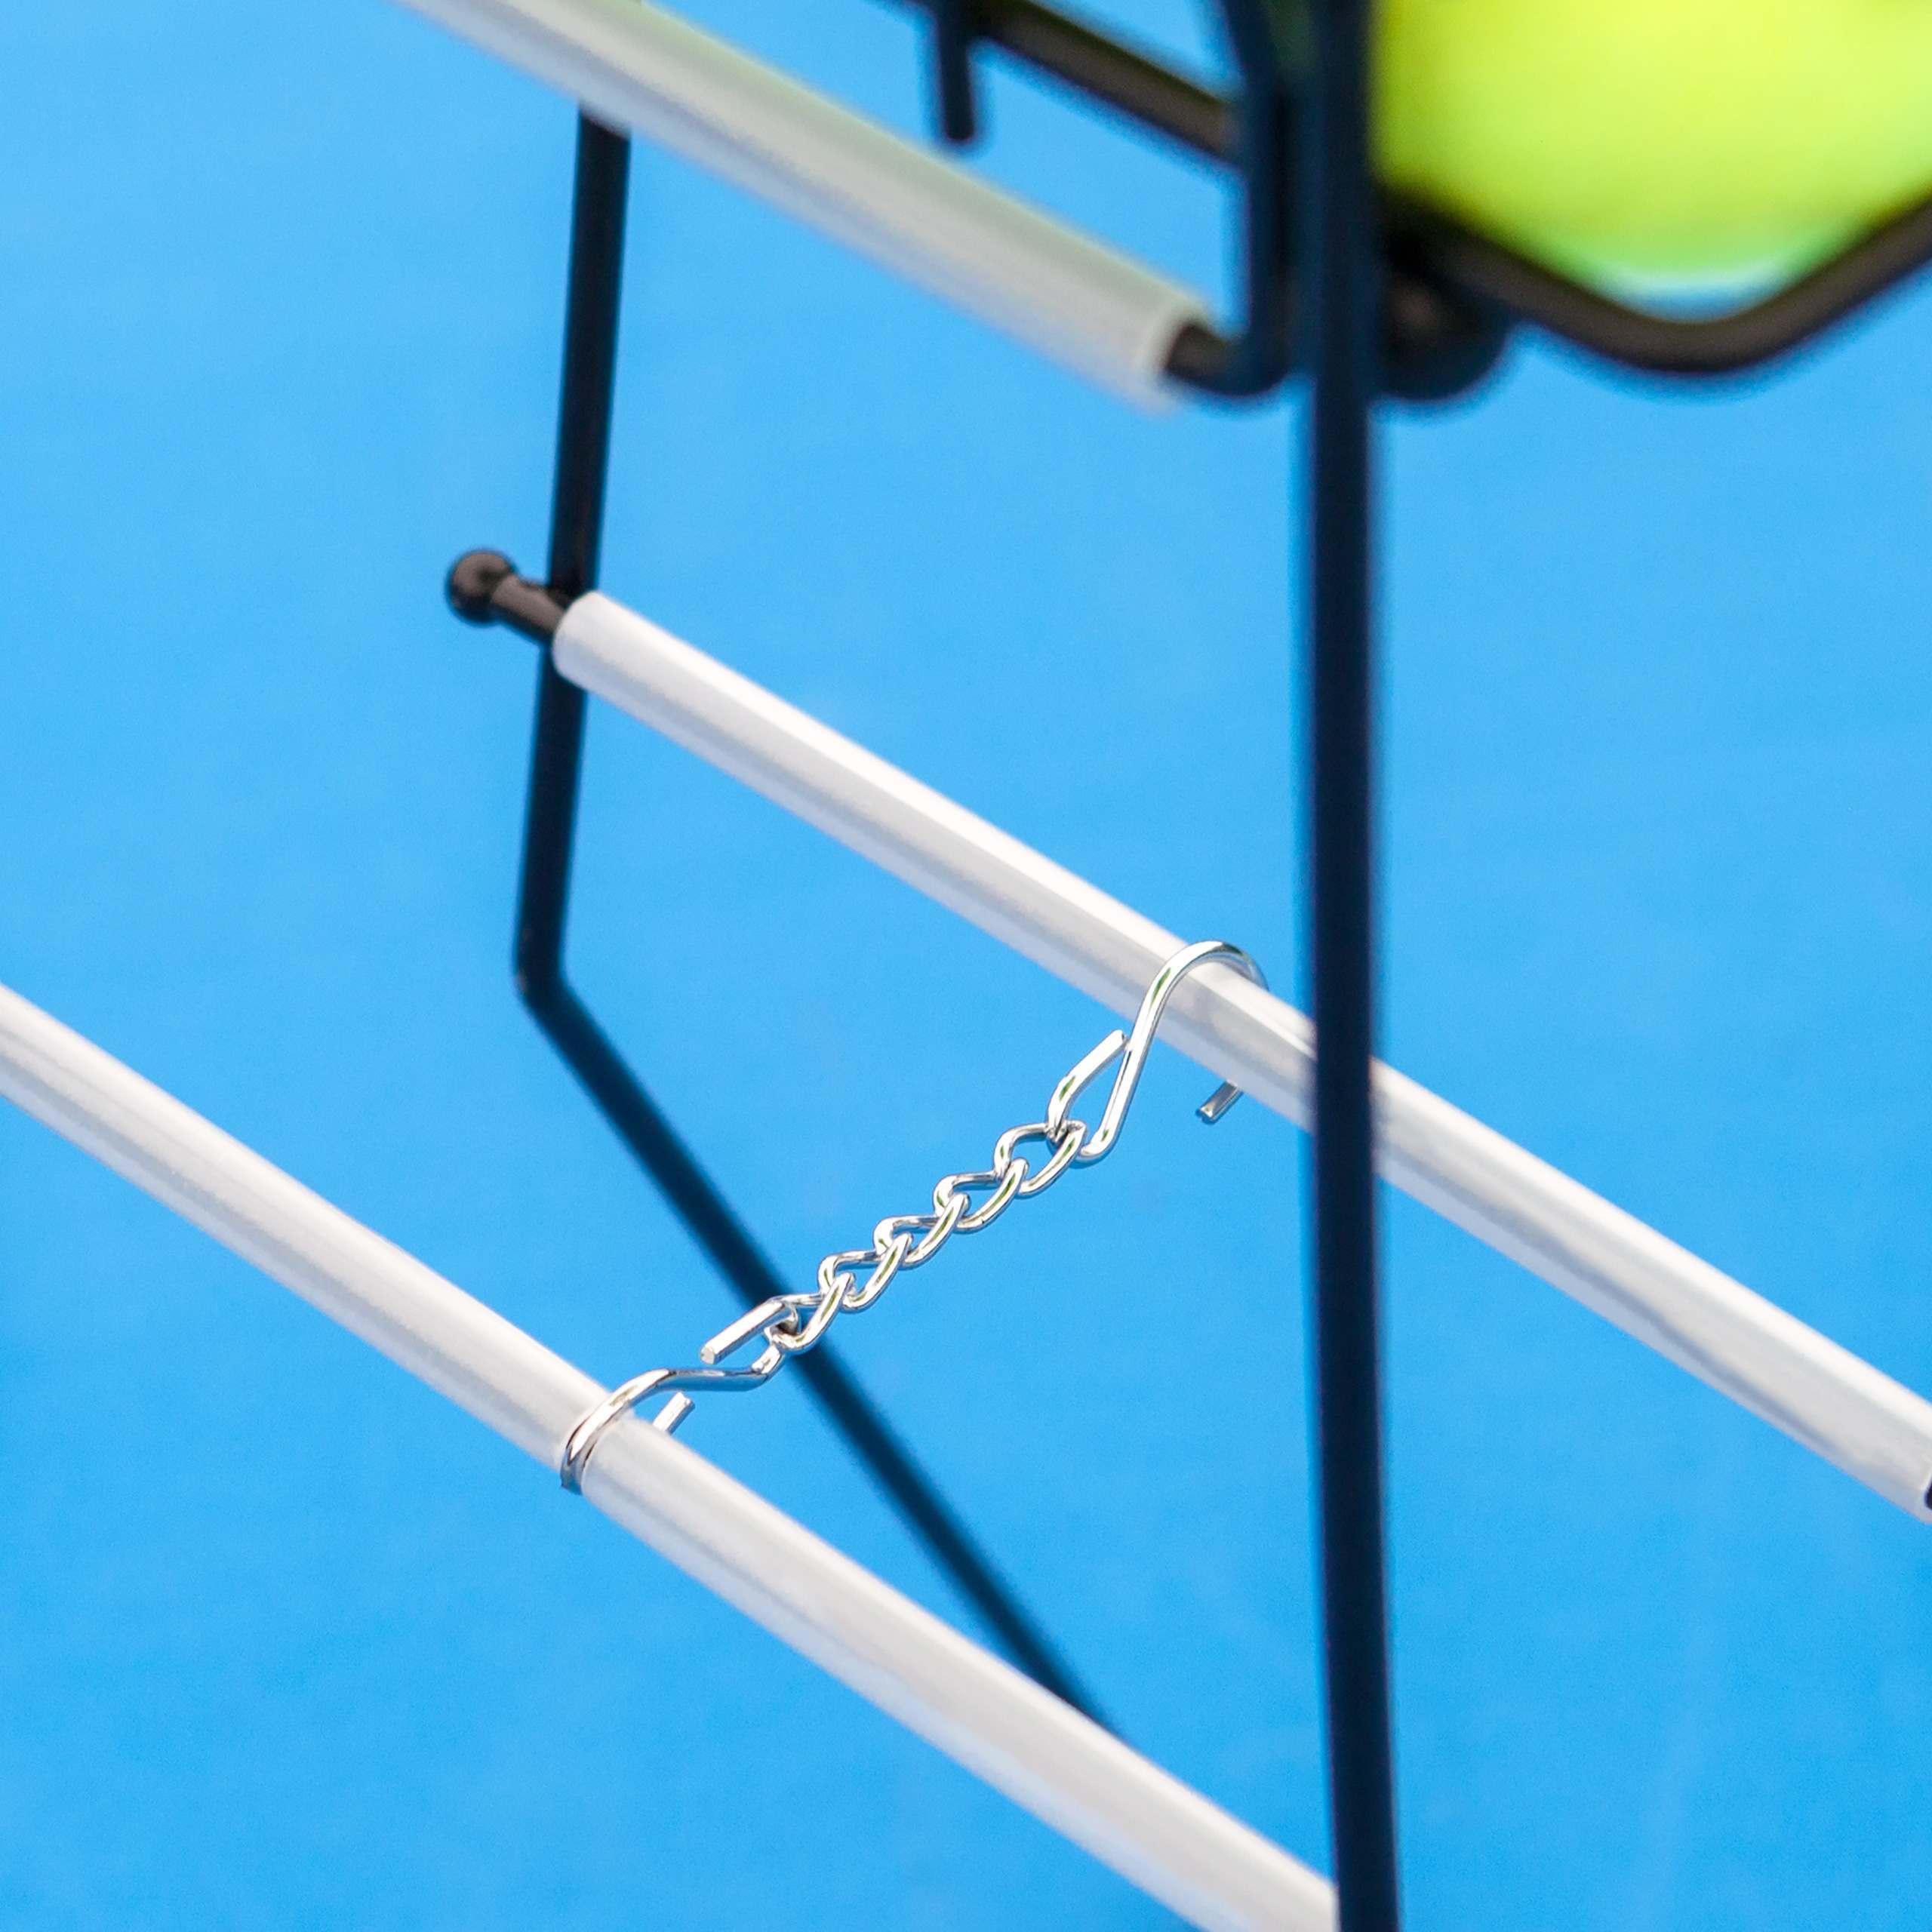 Tennis Ball Basket/Hopper Locking System